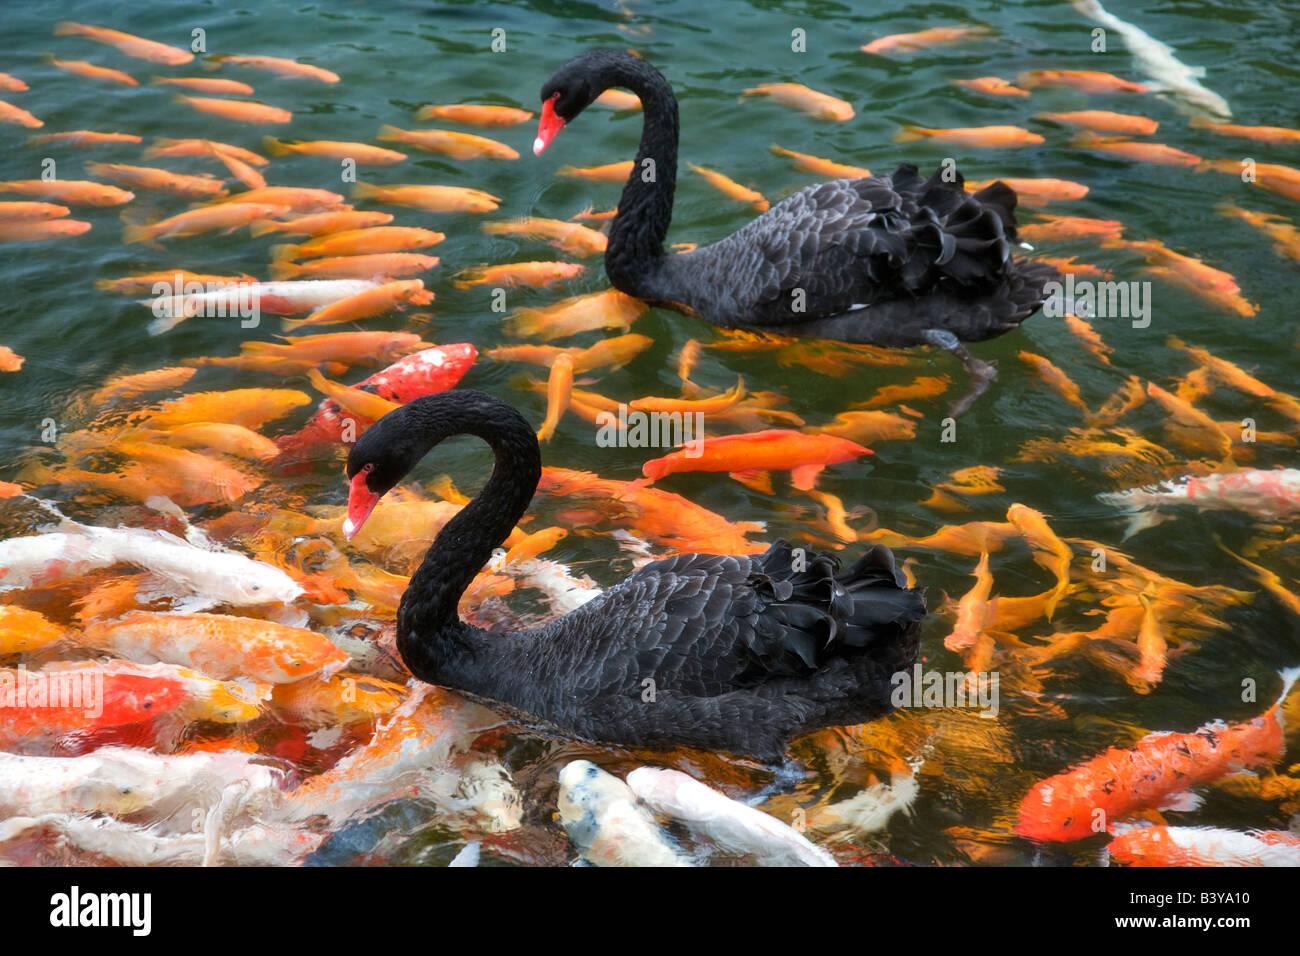 Black swan and koi fish hyatt hotel kauai hawaii stock for Black koi fish